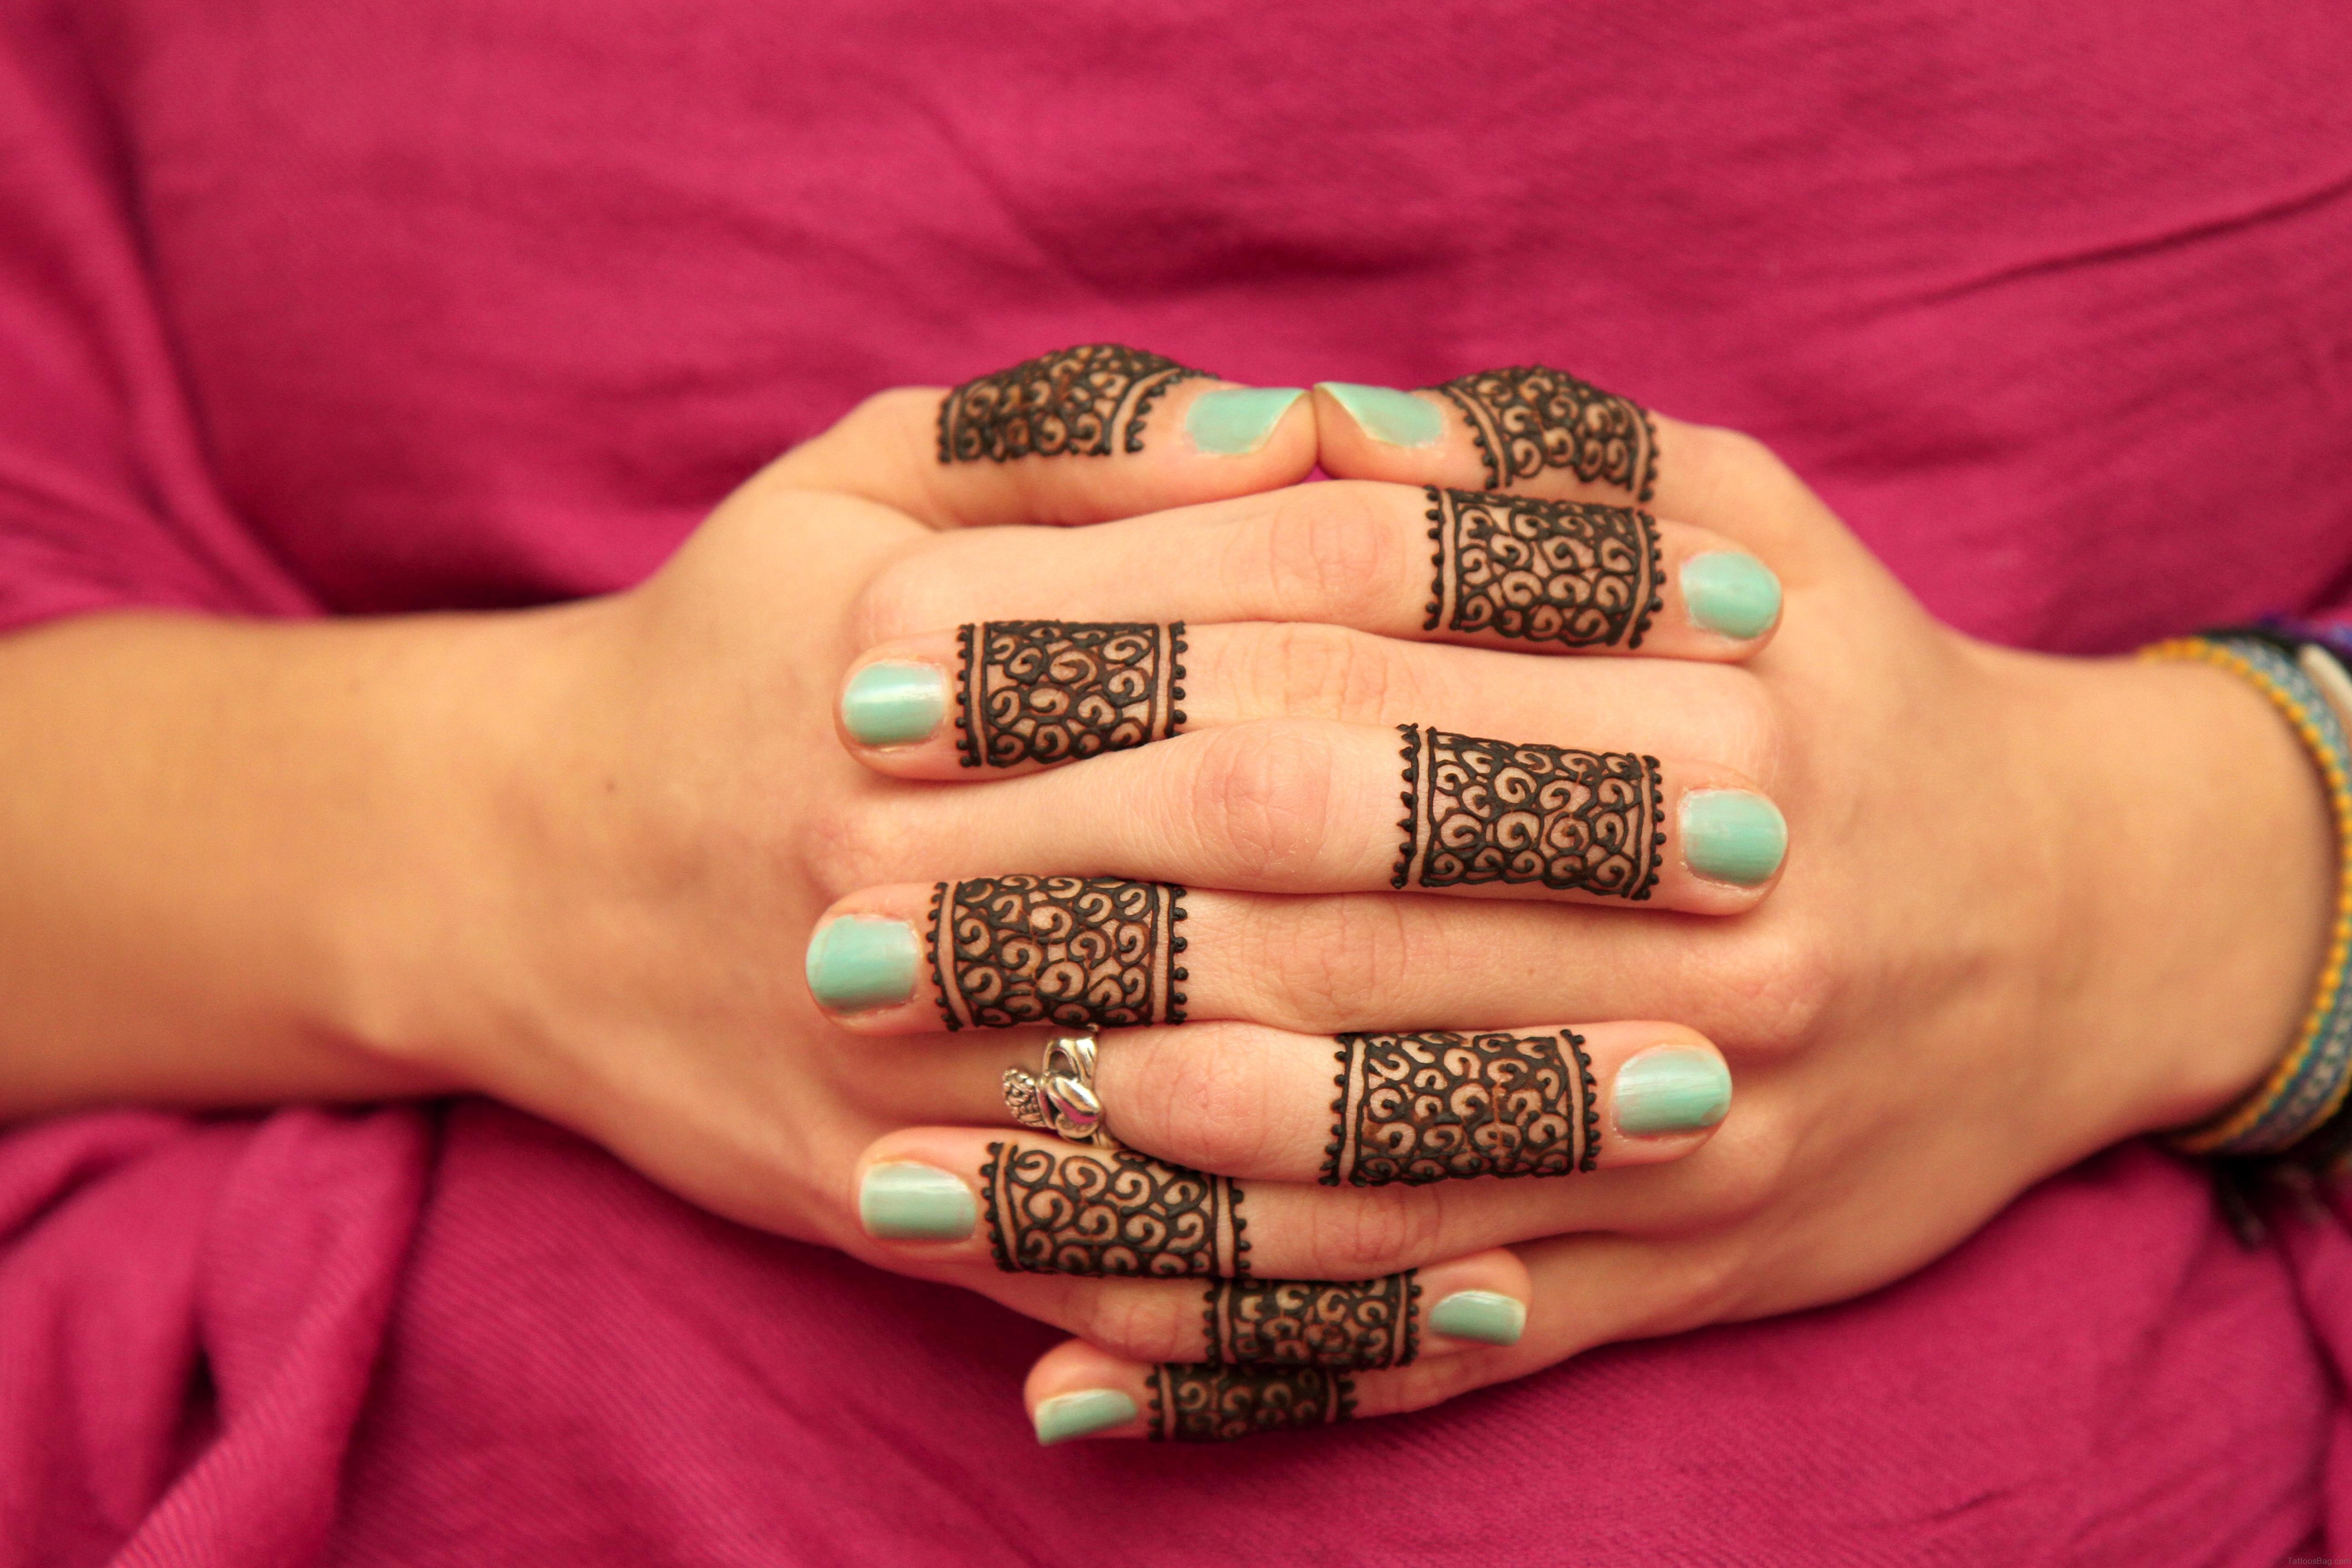 b0893530c 25 Pleasing Egyptian Tattoos On Fingers